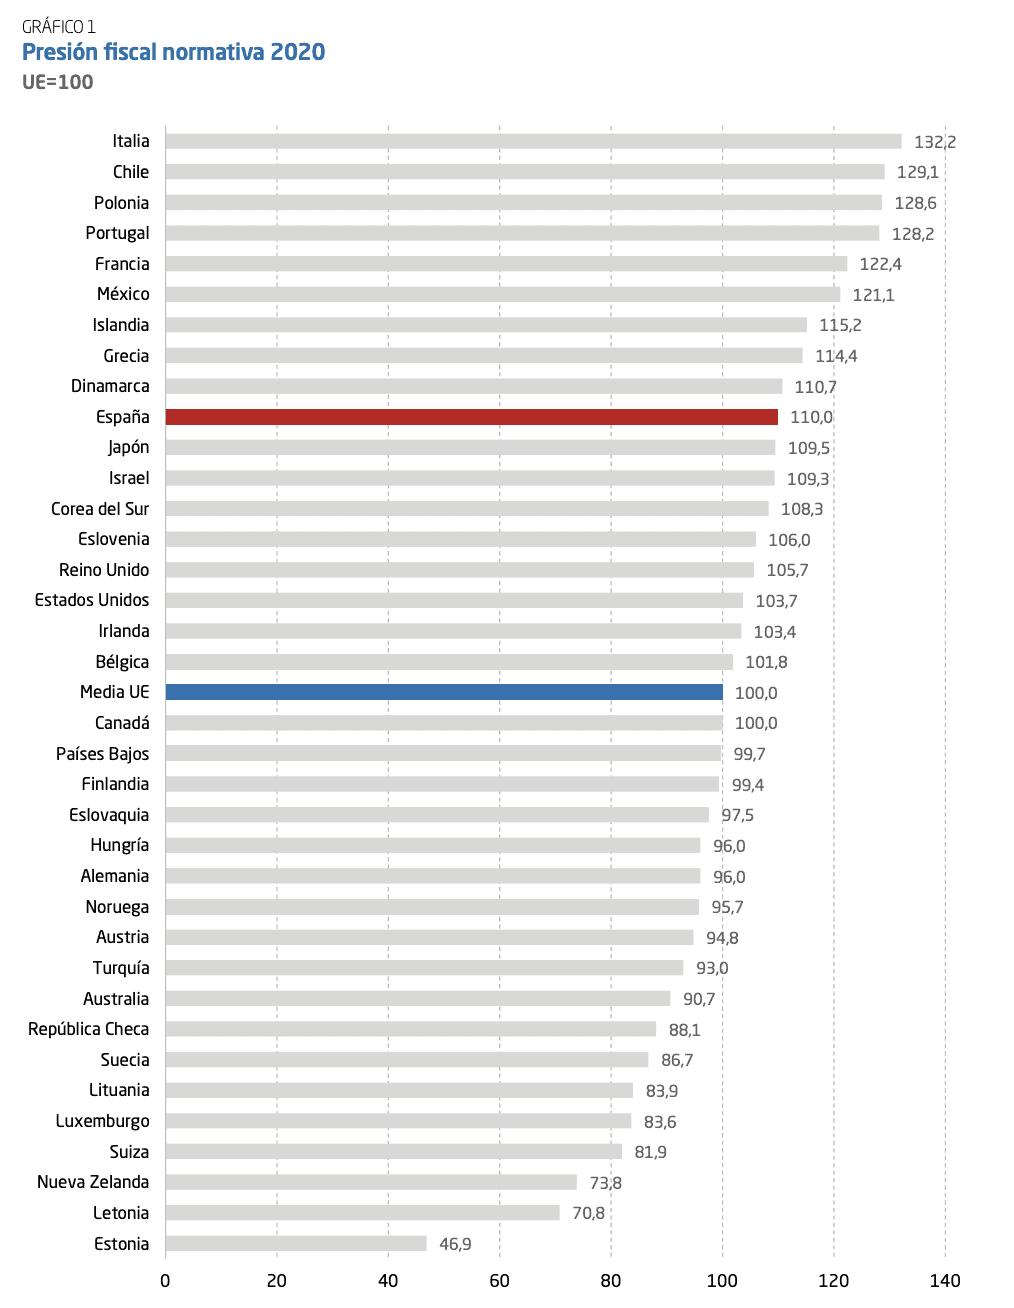 Presion fiscal comparada - Internacional